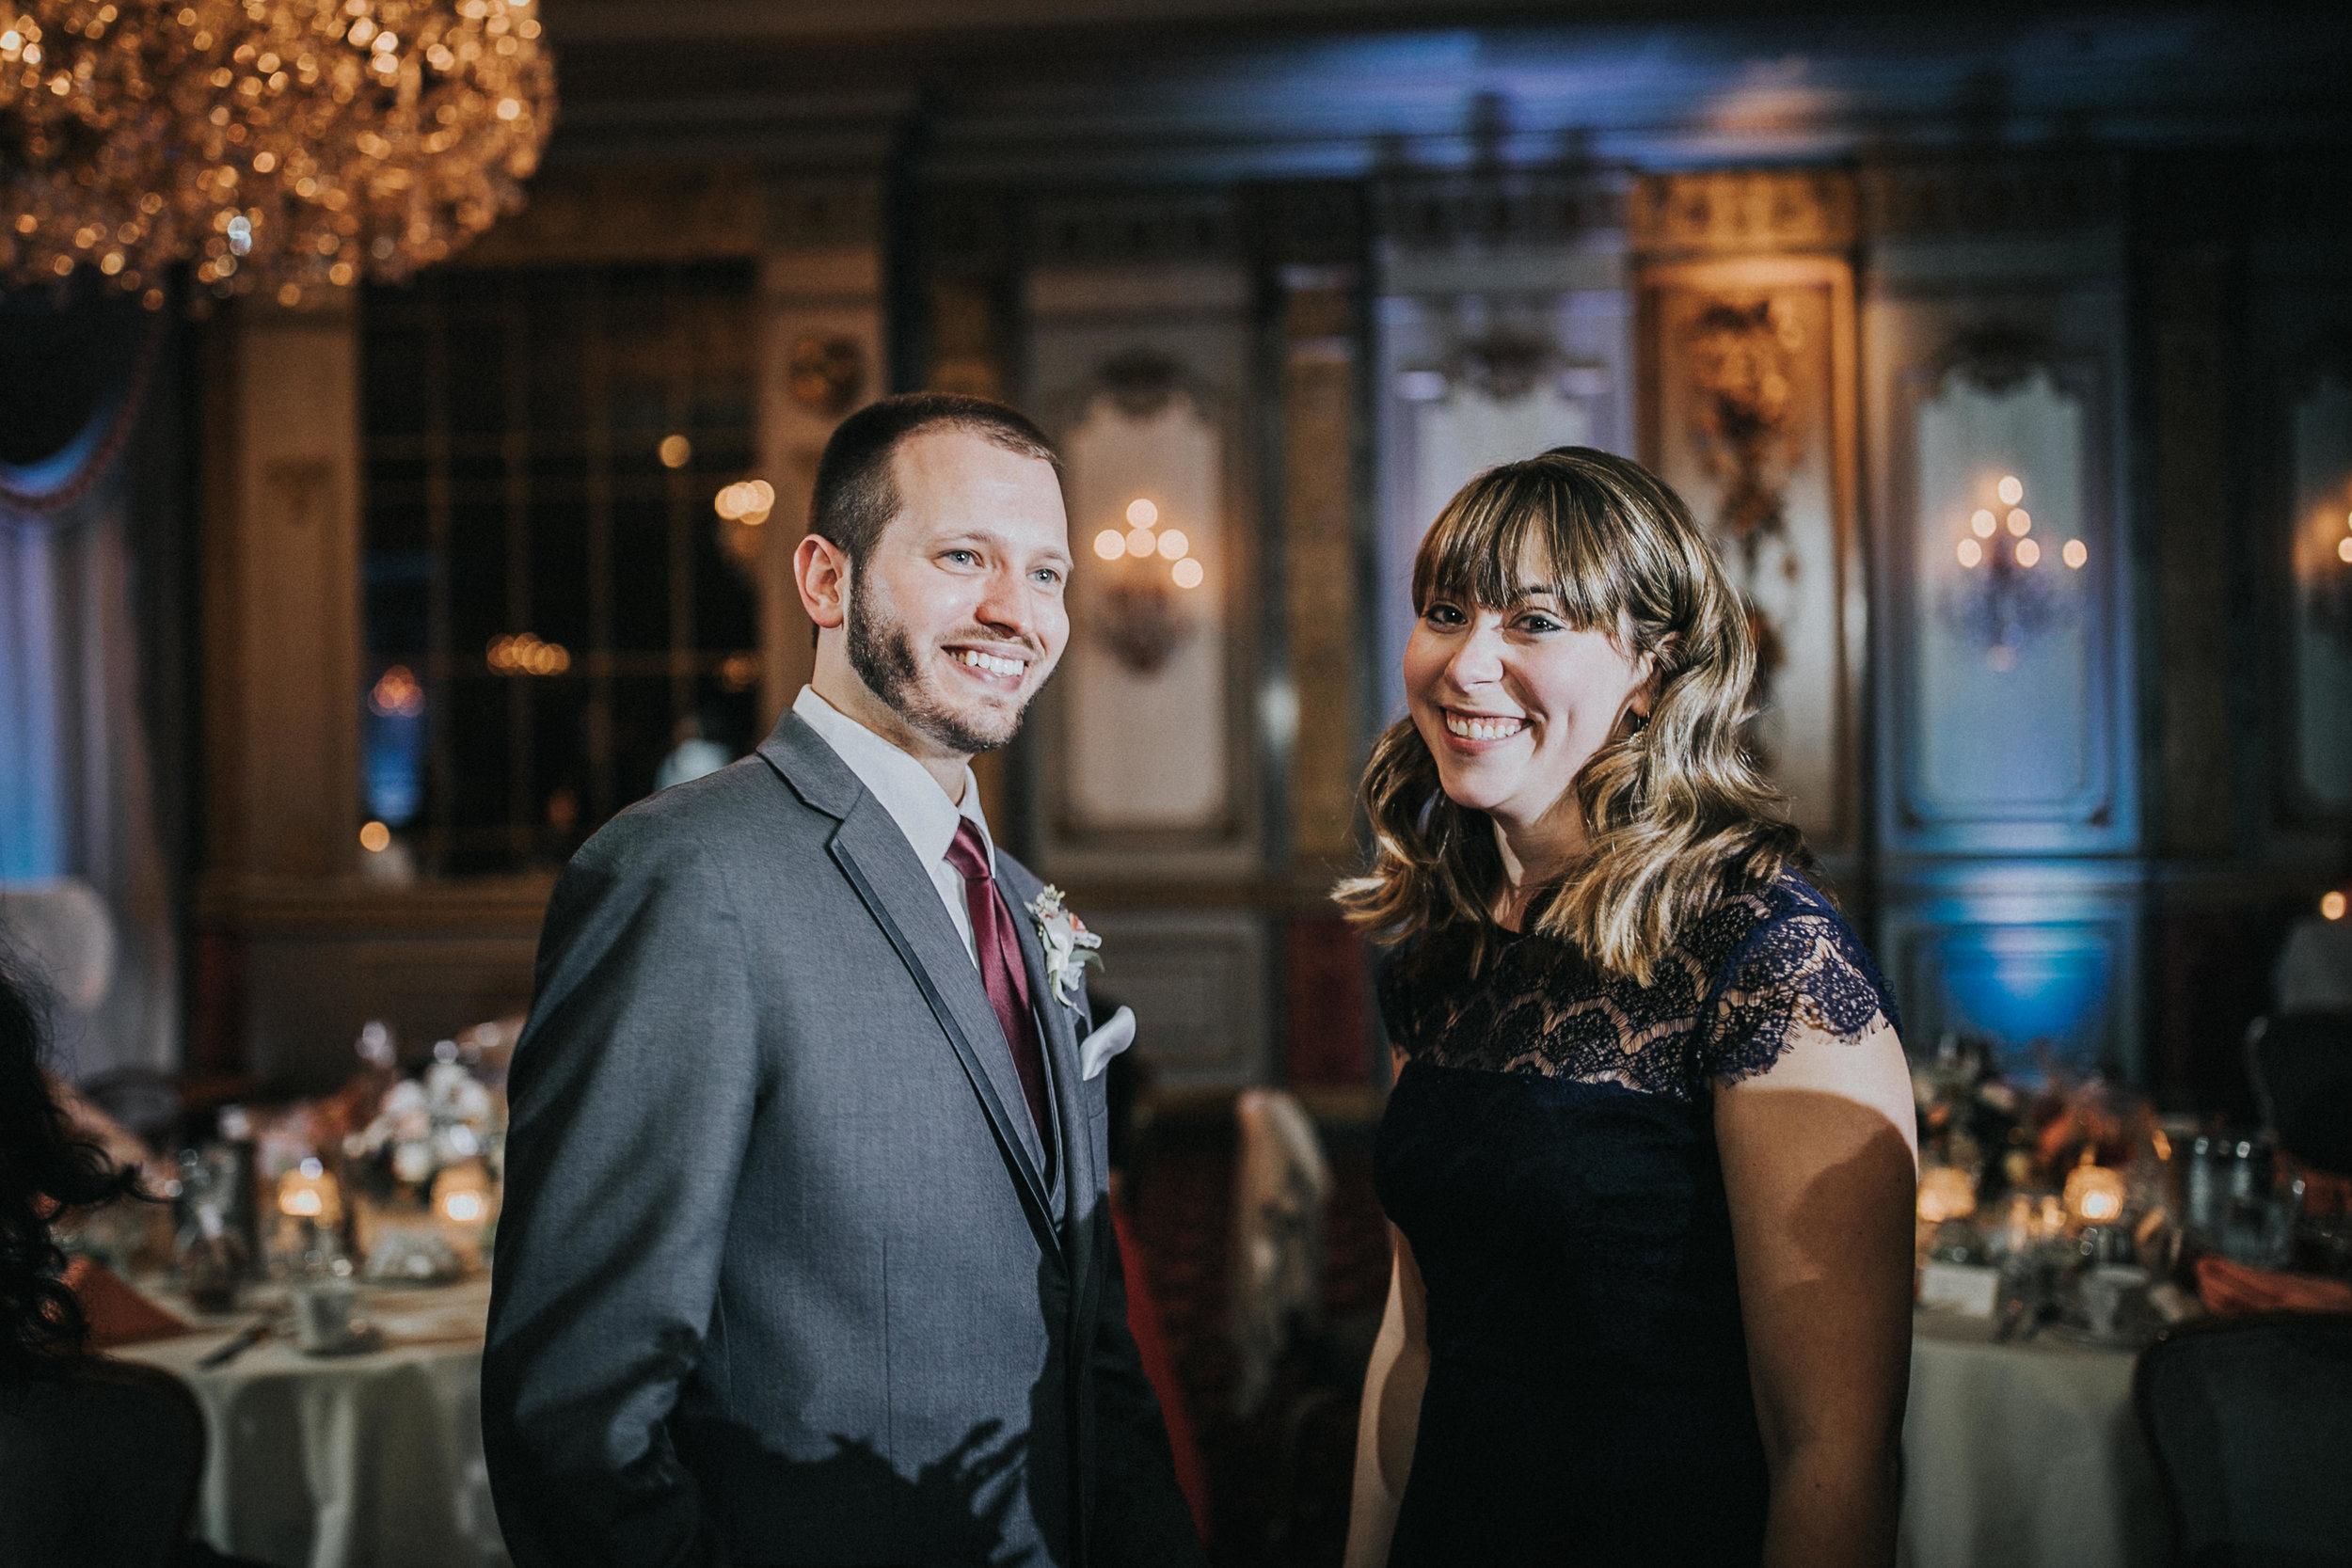 New-Jersey-Wedding-Photography-Fishers-Tudor-House-JennaLynnPhotography-Reception-Kathleen&Eddie-126.jpg